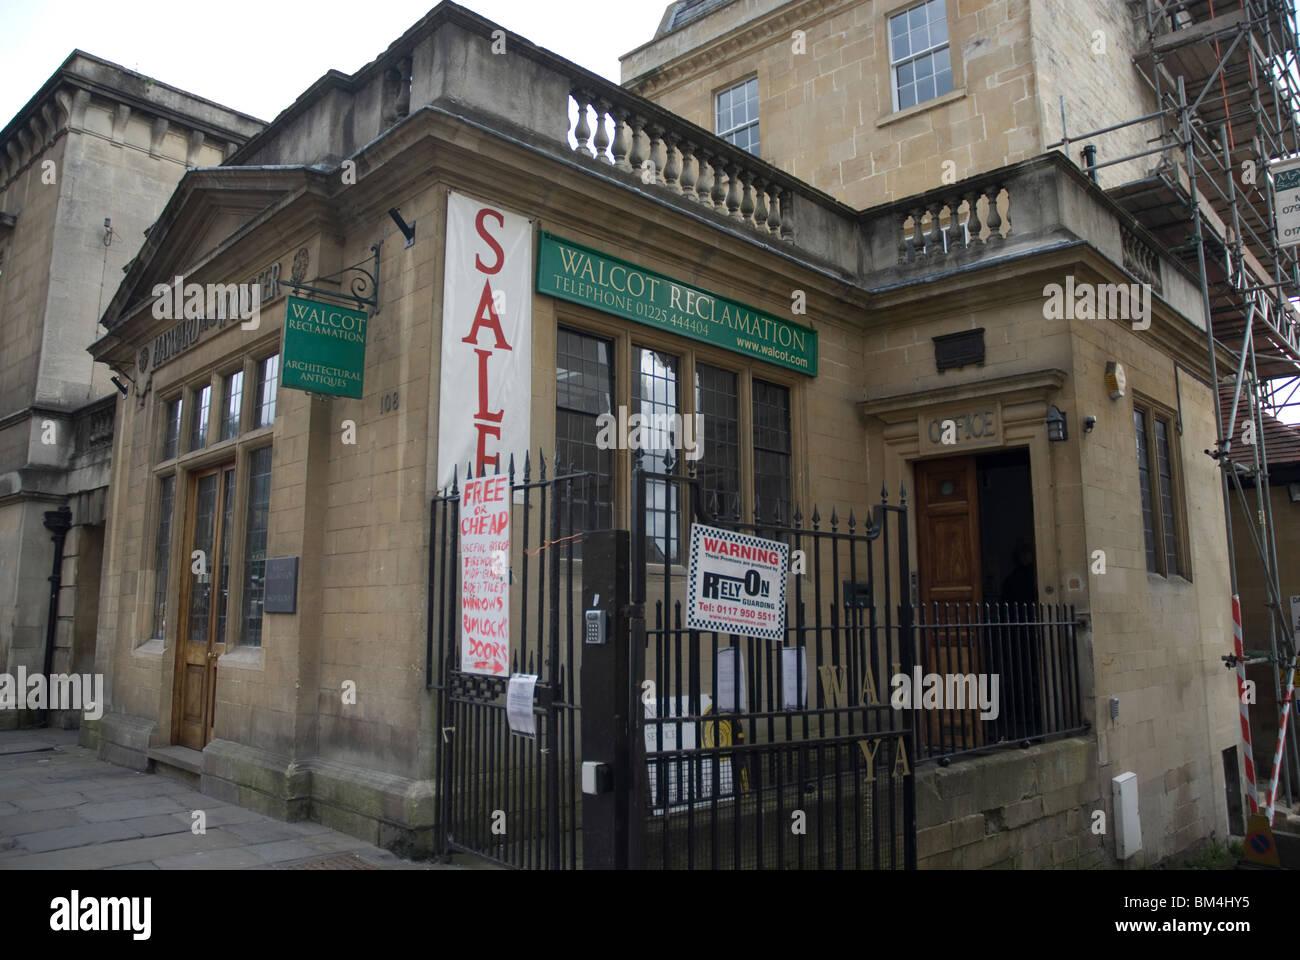 Reclamation Yard Somerset England Stock Photos & Reclamation Yard ...